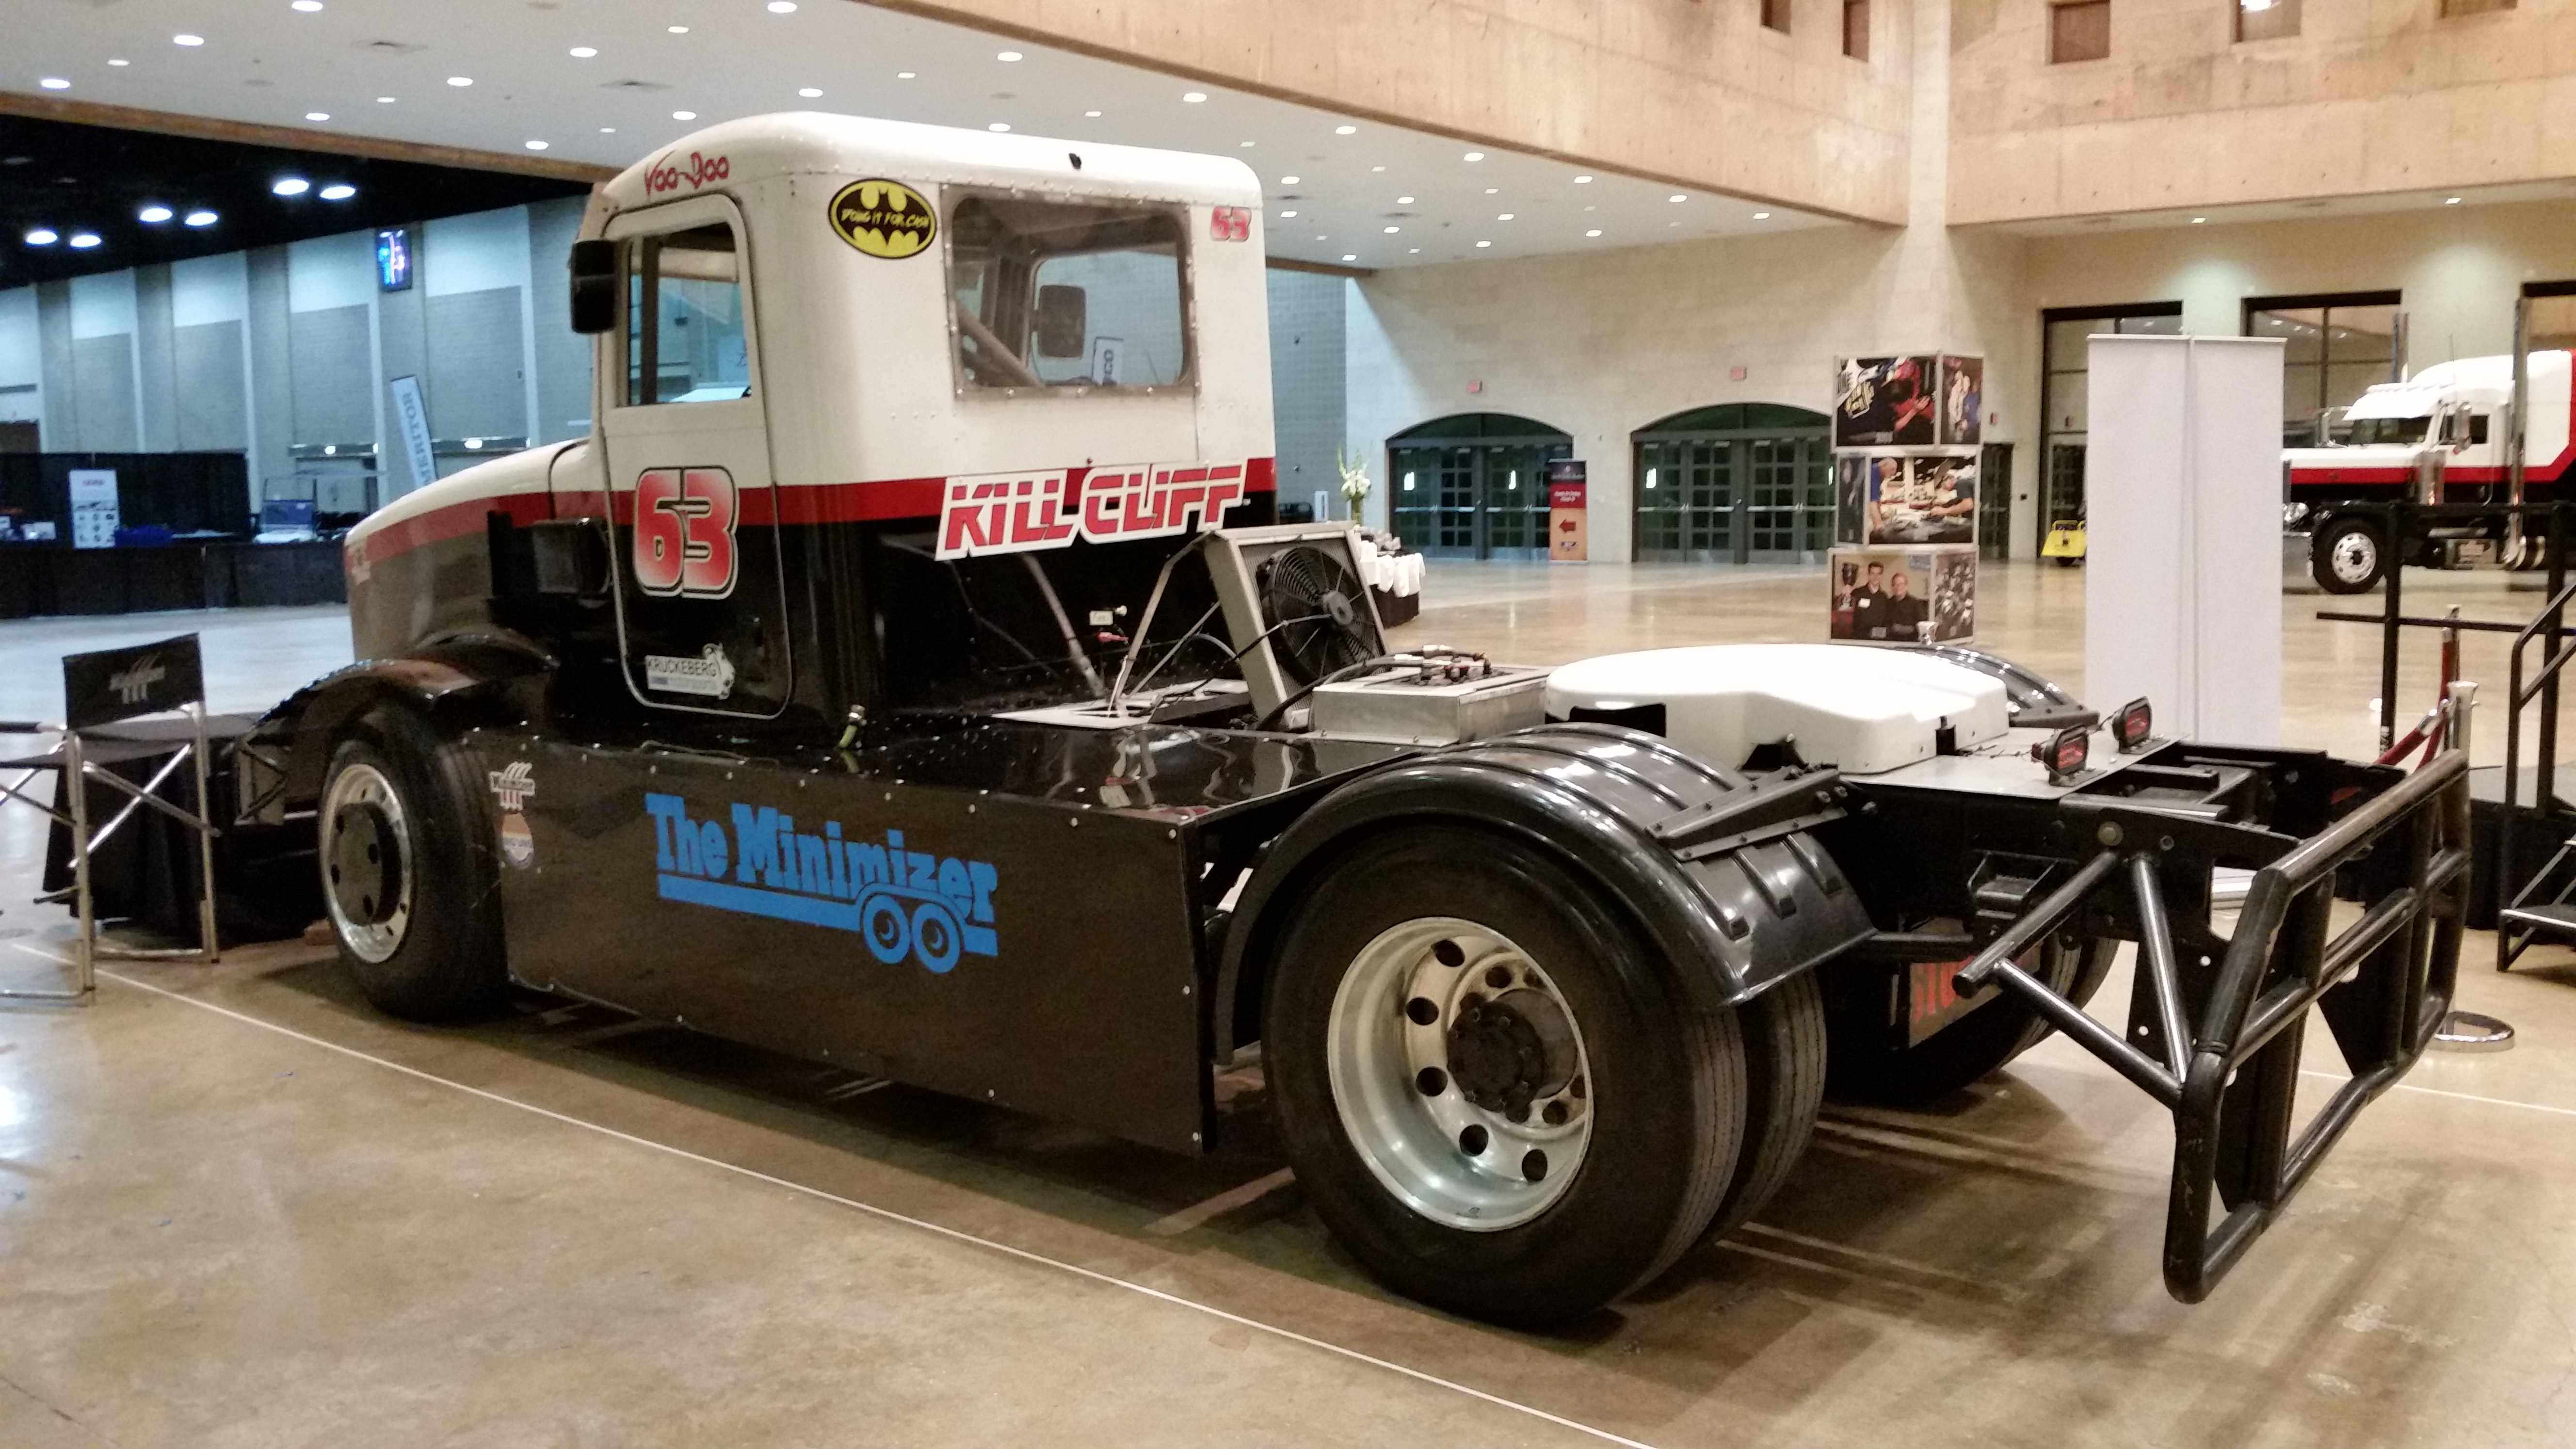 The Minimizer racing semi truck displayed on showroom floor